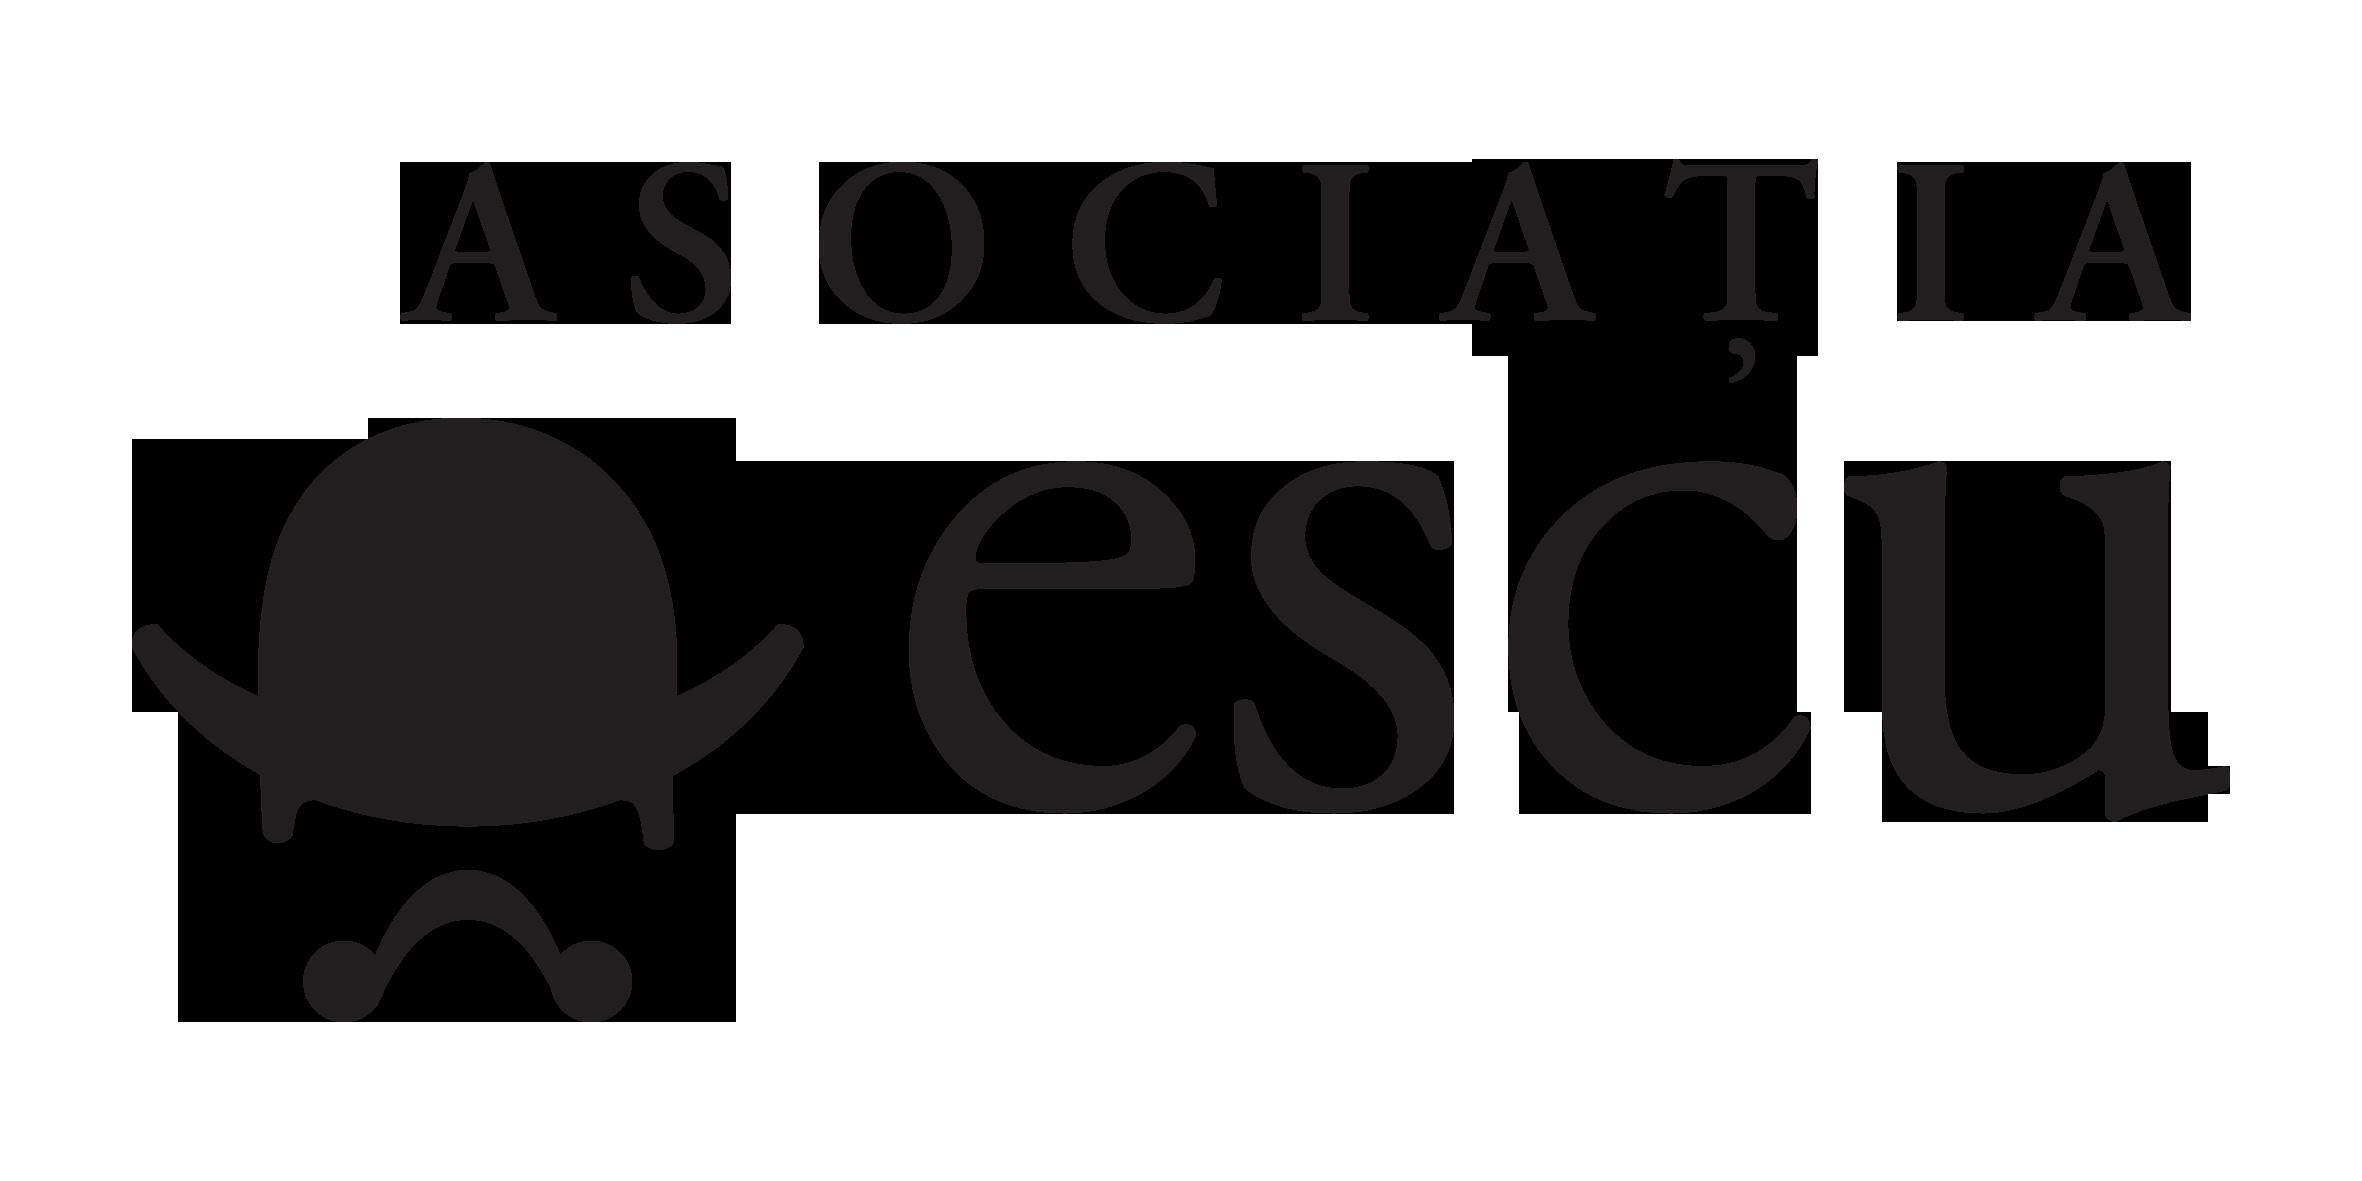 Asociatia ESCU logo